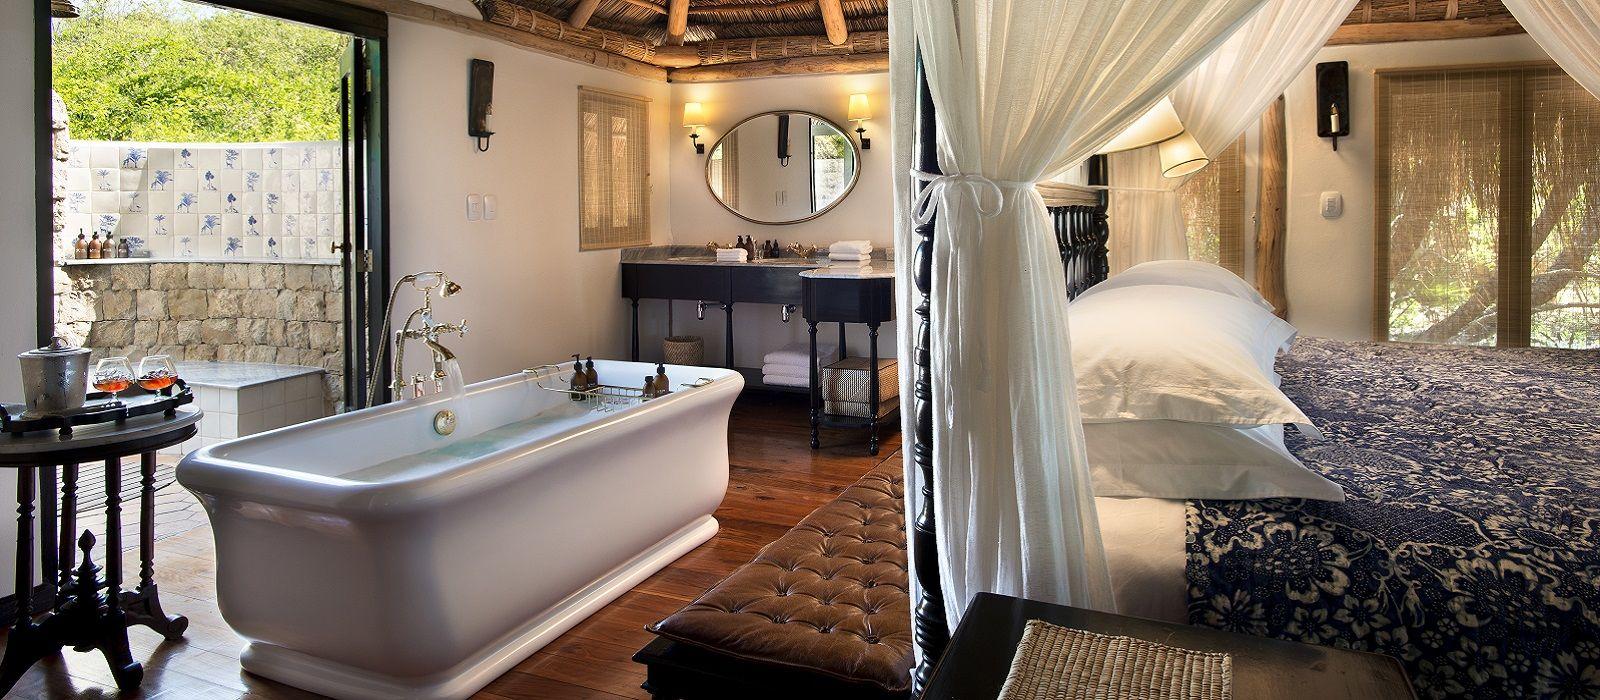 Hotel &Beyond Benguerra Island Lodge Mozambique